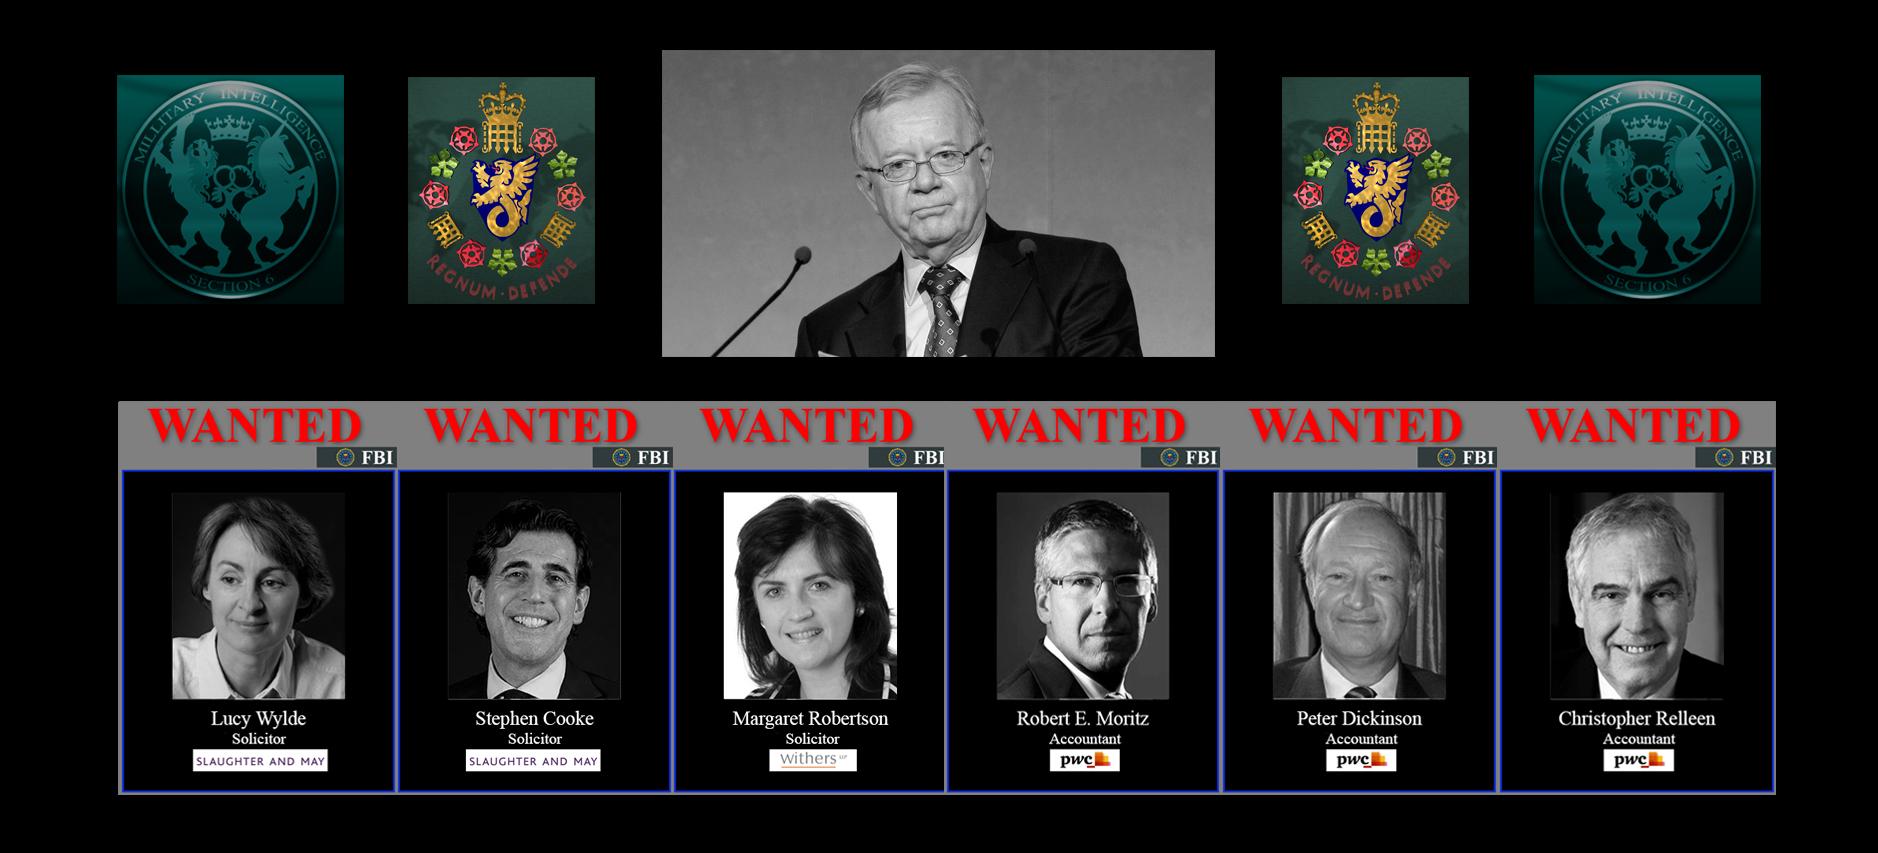 Public interest immunity crown privilege da notice news - National westminster bank plc head office address ...